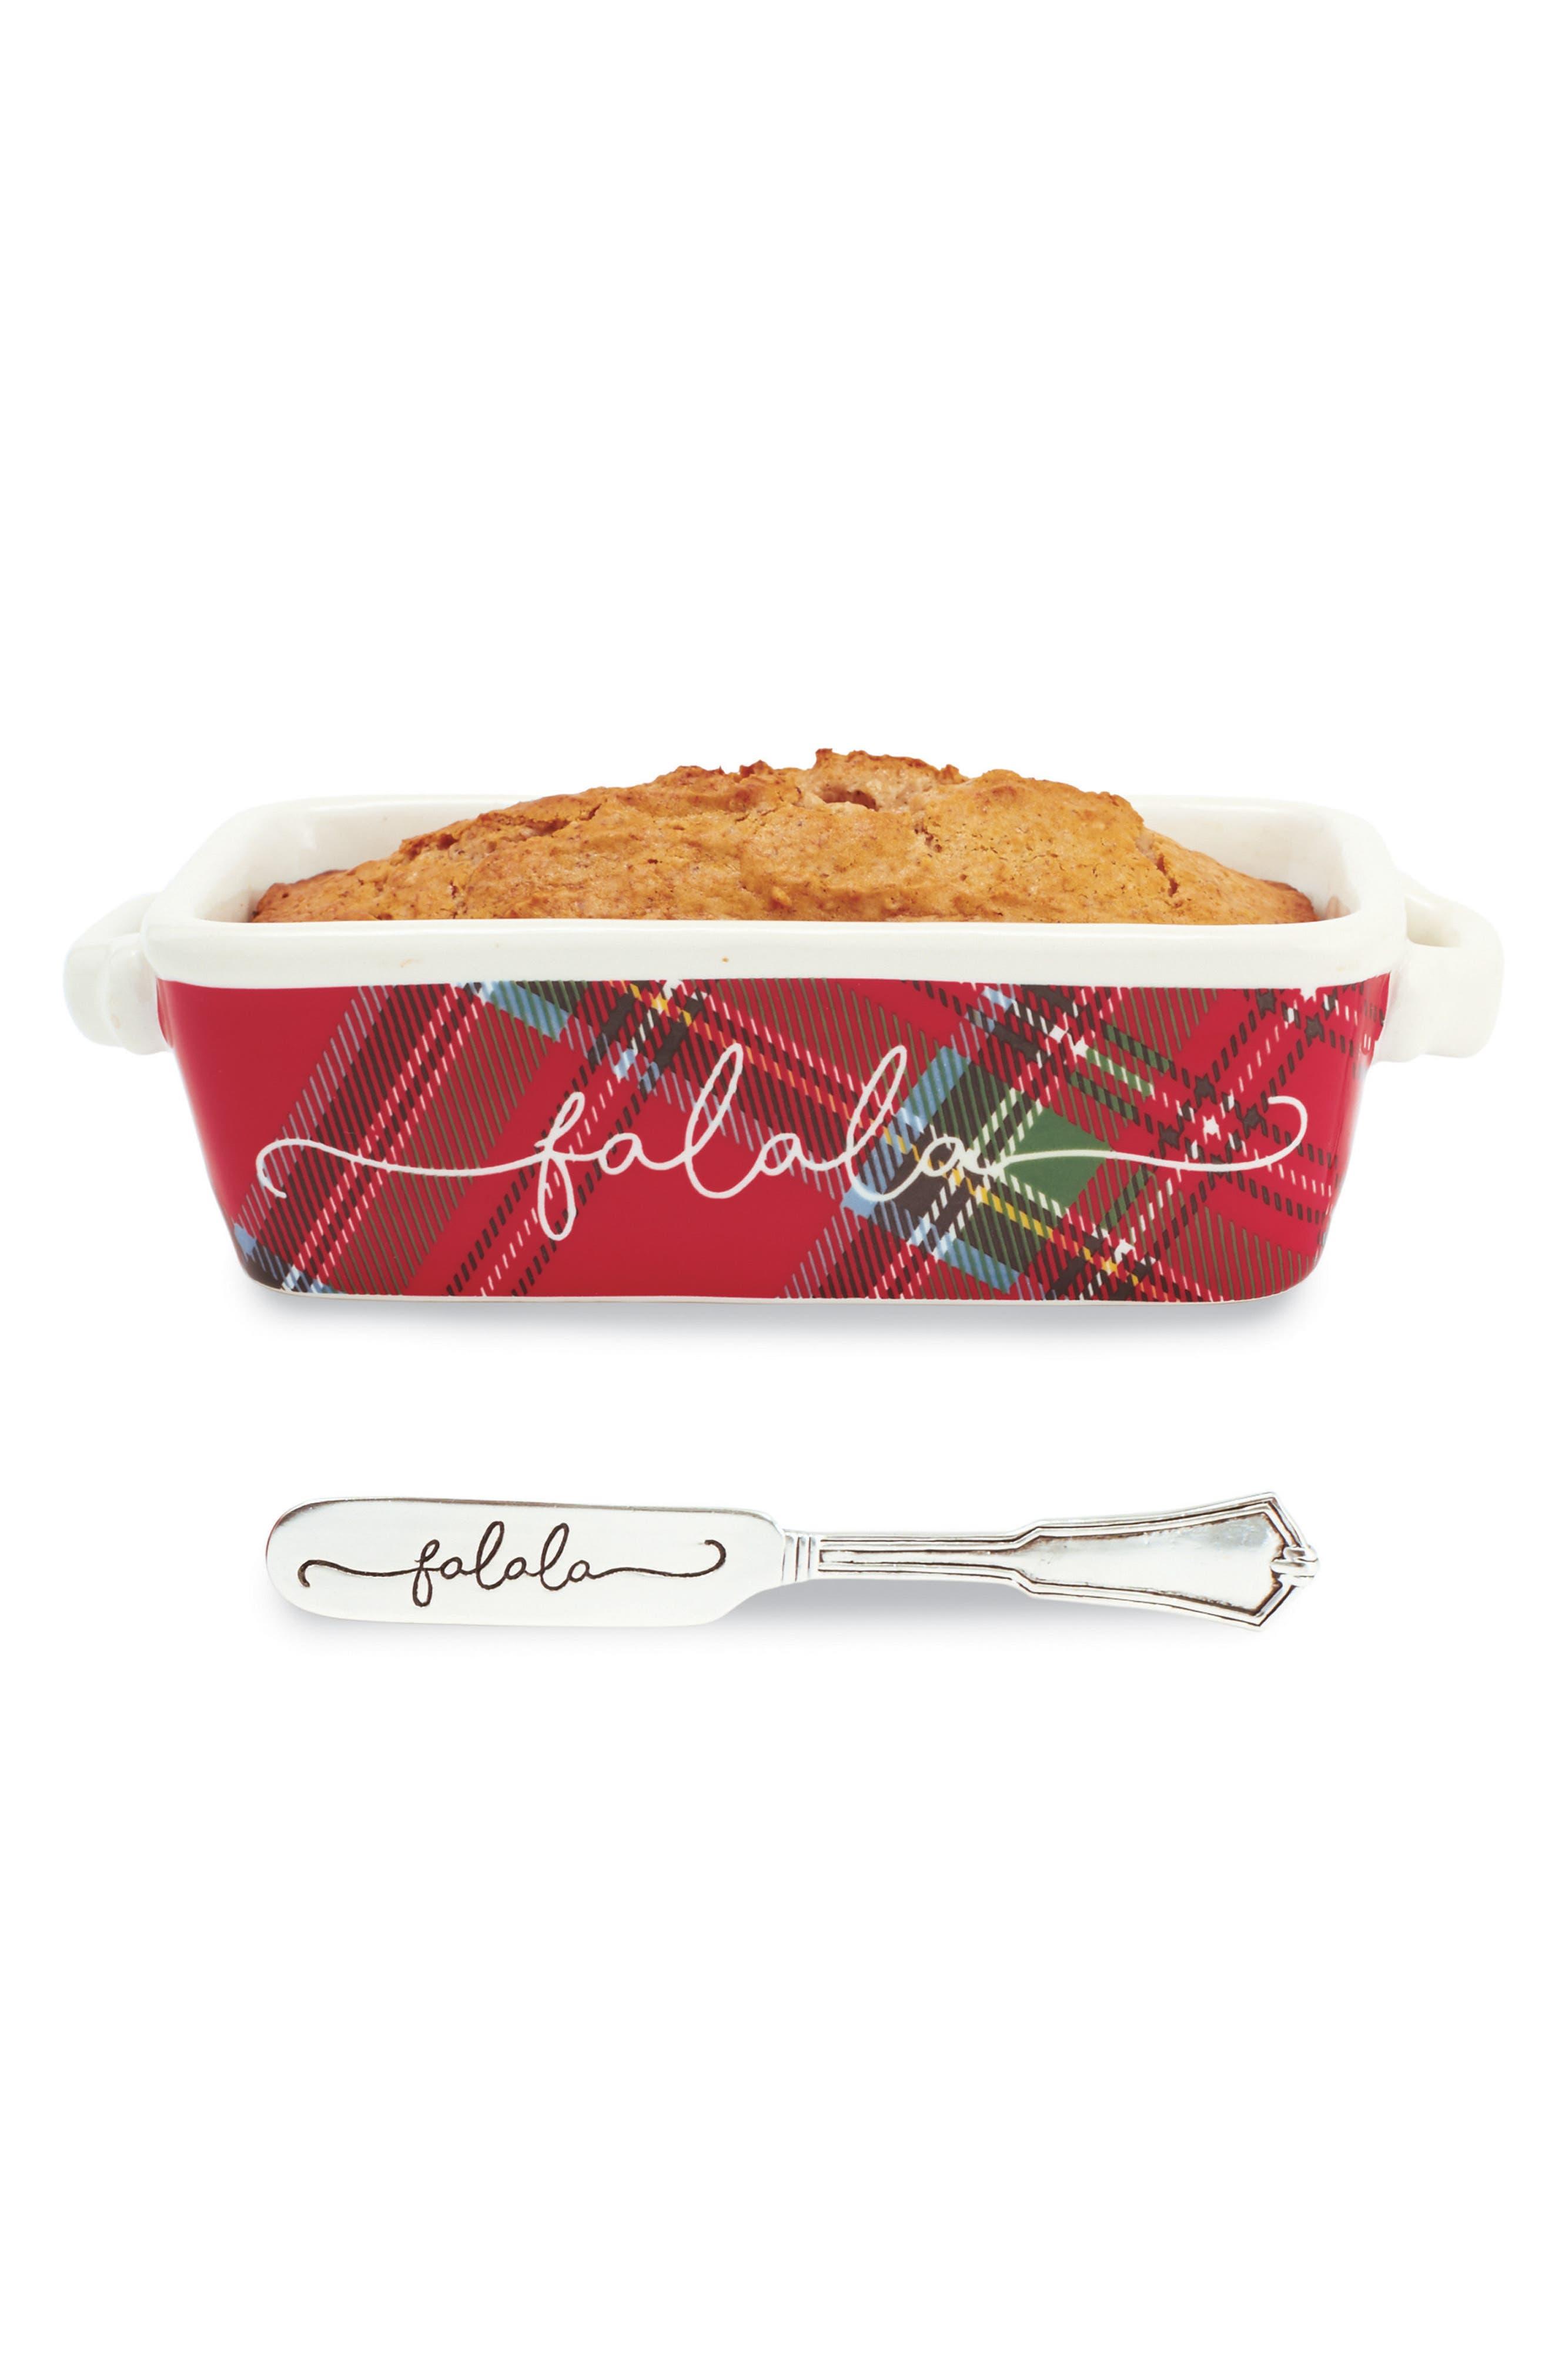 Fa La La Tartan Ceramic Mini Loaf Pan & Spreader,                         Main,                         color,